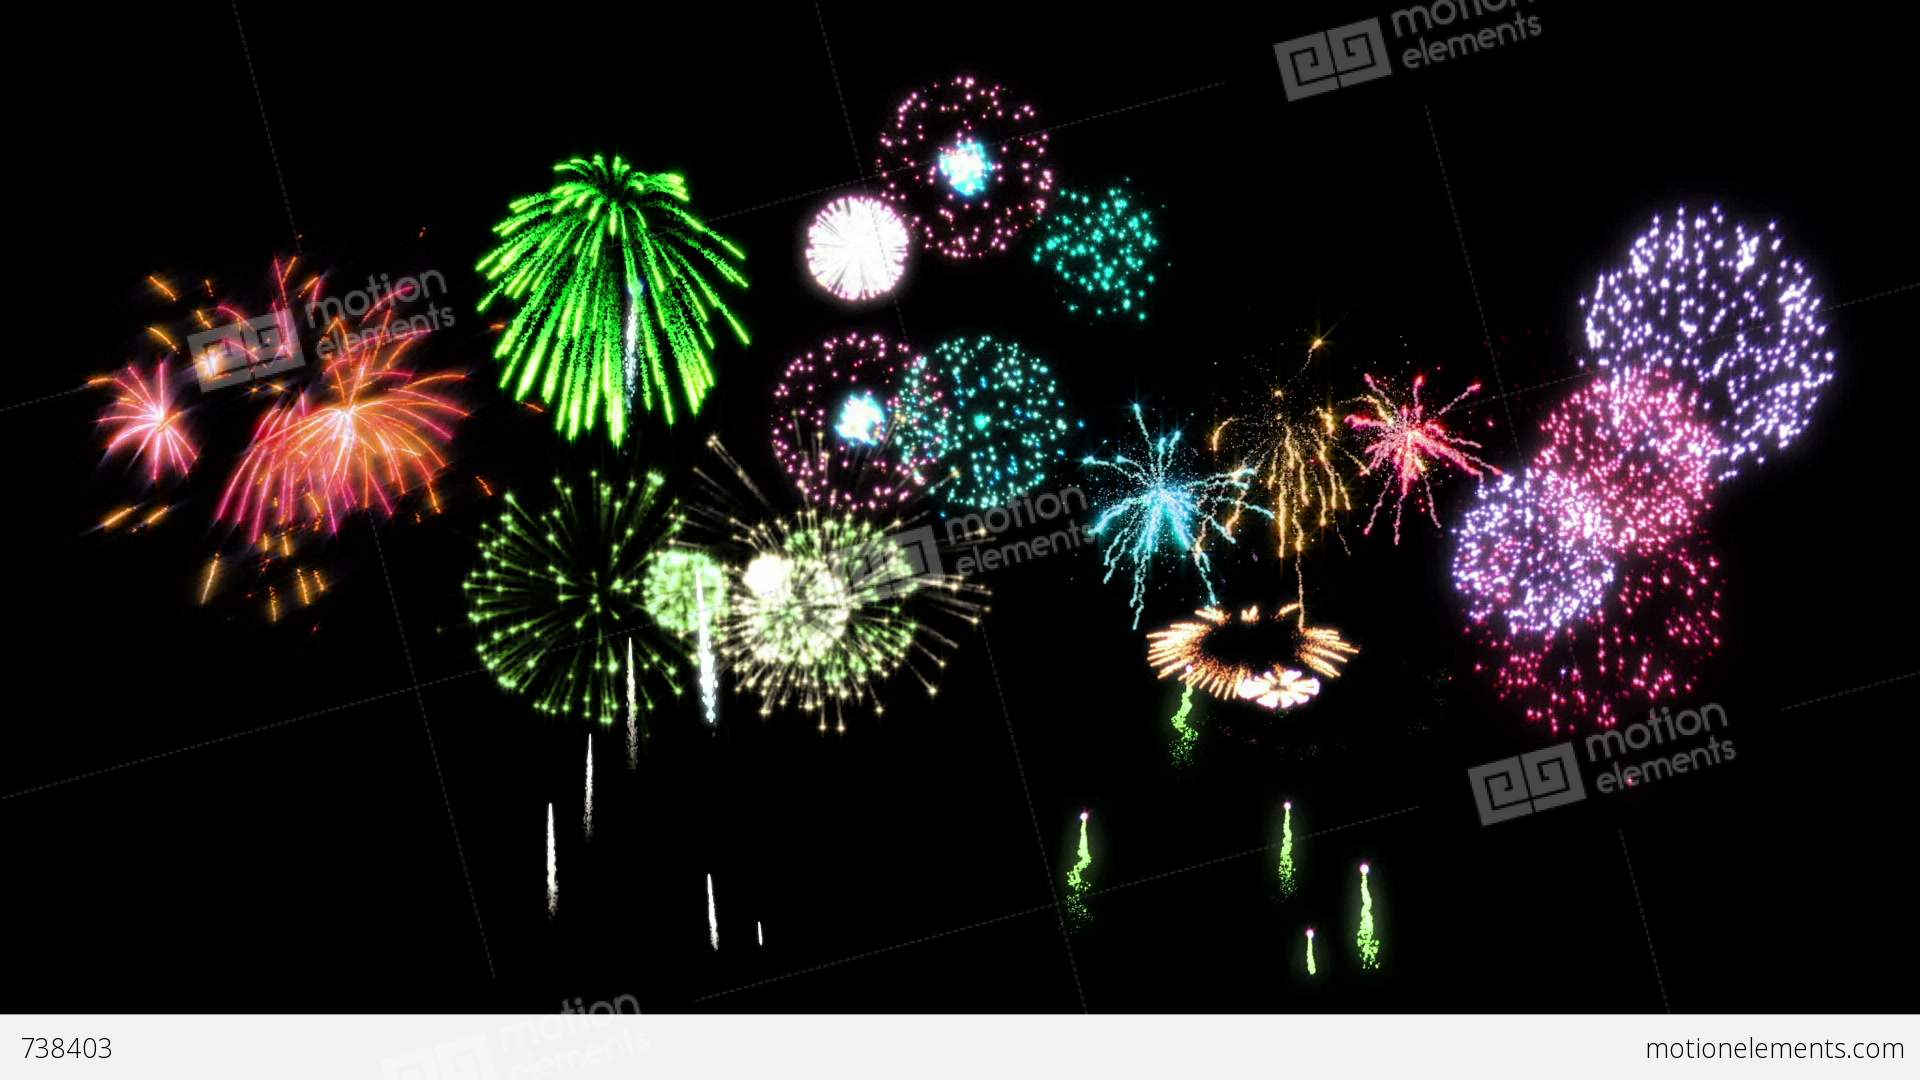 Fireworks Animated Gif